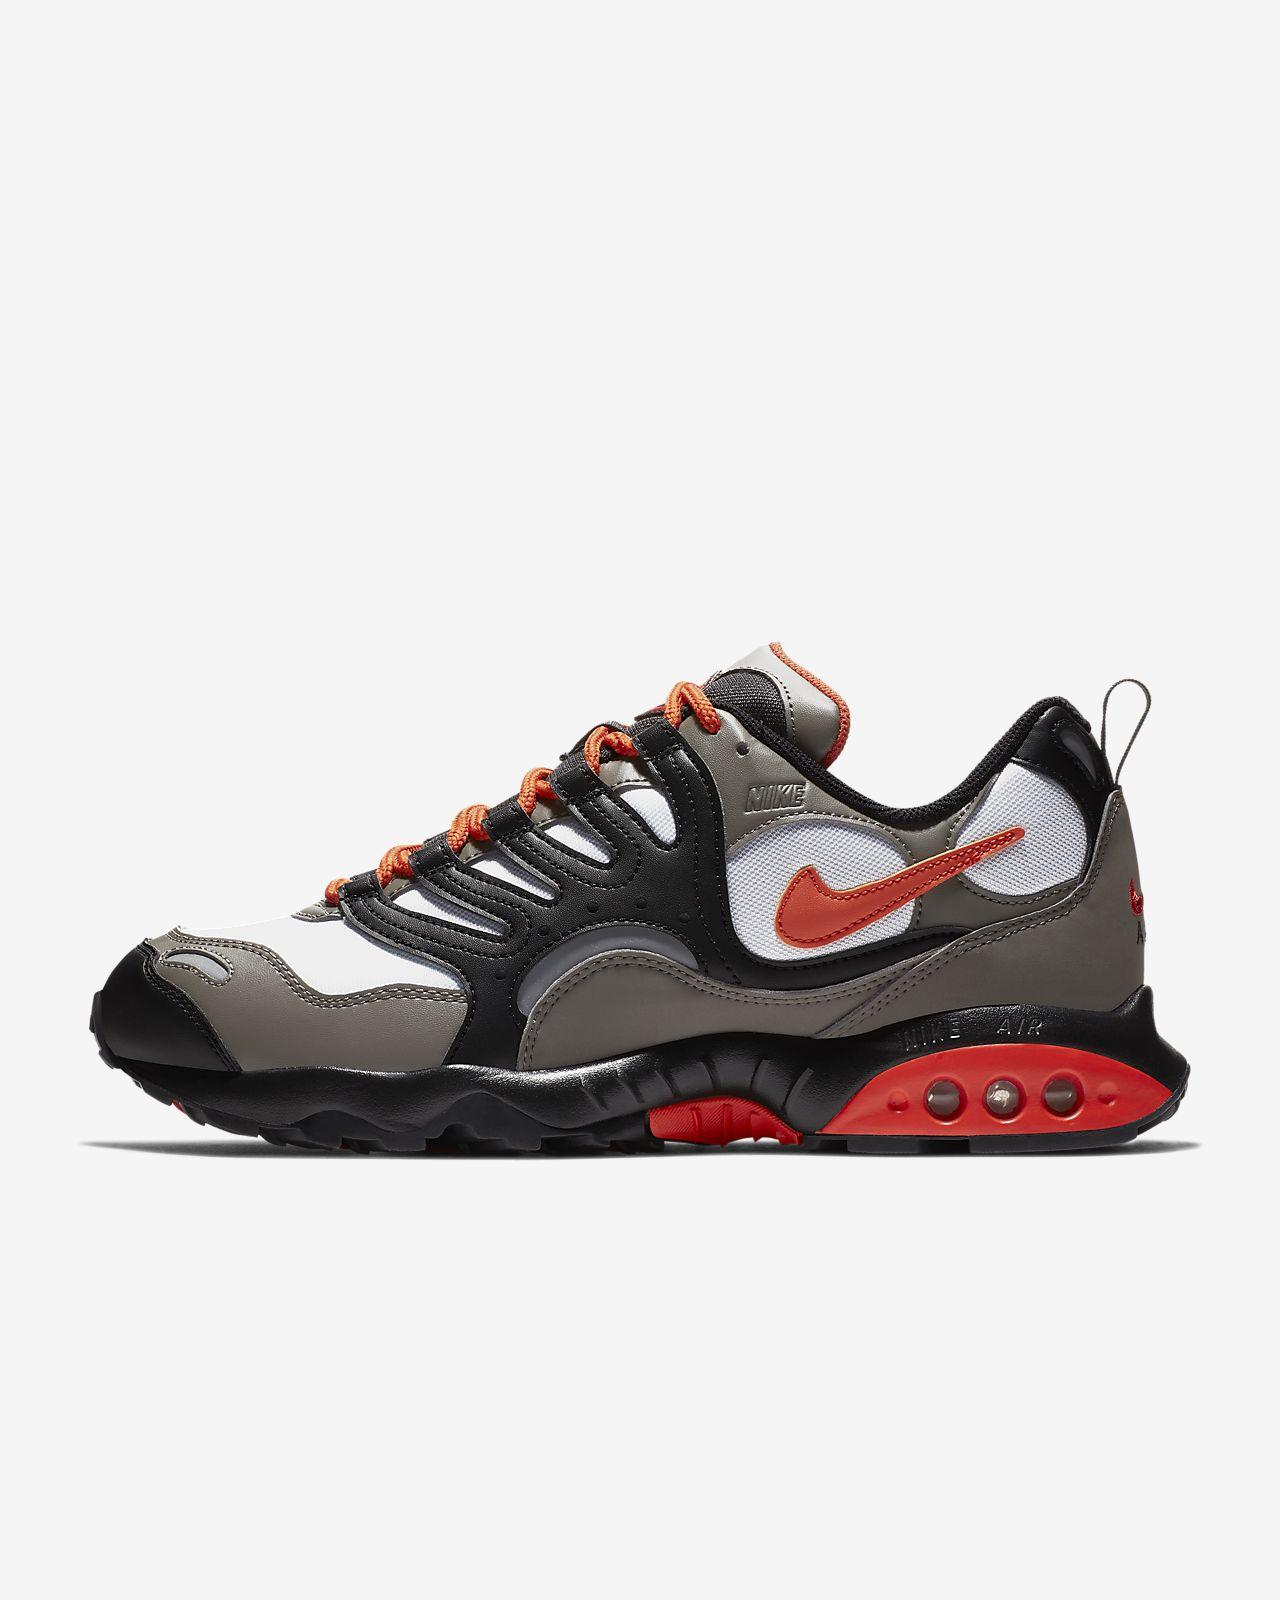 573538a453285 Nike Air Terra Humara 18 Men s Shoe. Nike.com GB